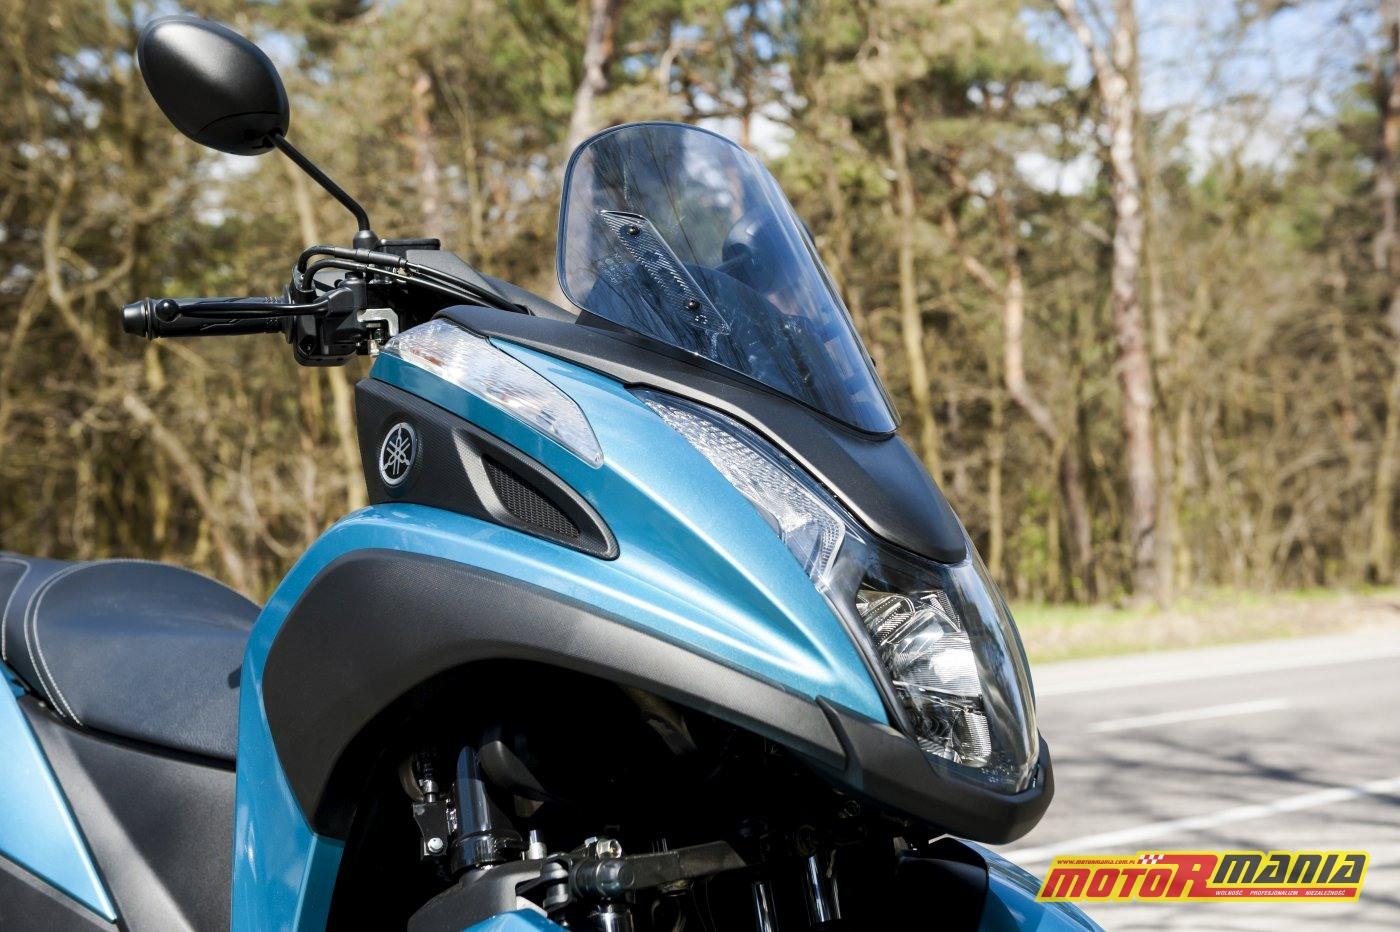 Yamaha Tricity 125 test motormania - fot Tomazi_pl (8)